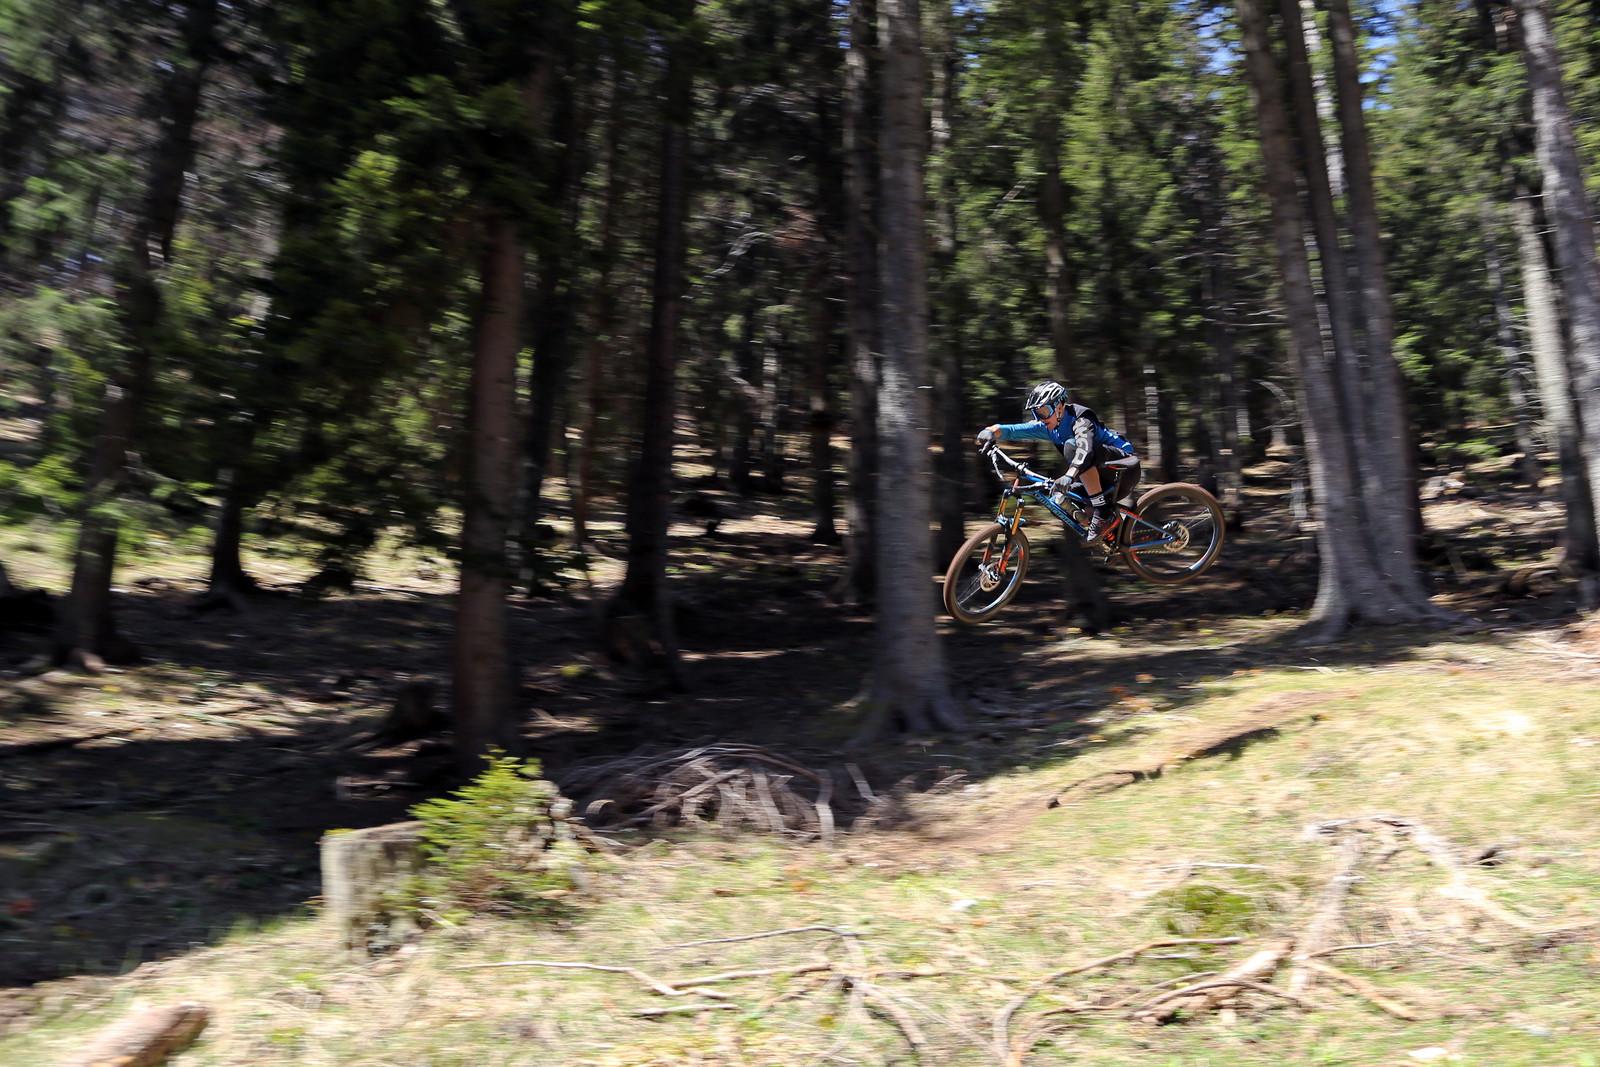 Vid Peršak 02 - porson - Mountain Biking Pictures - Vital MTB